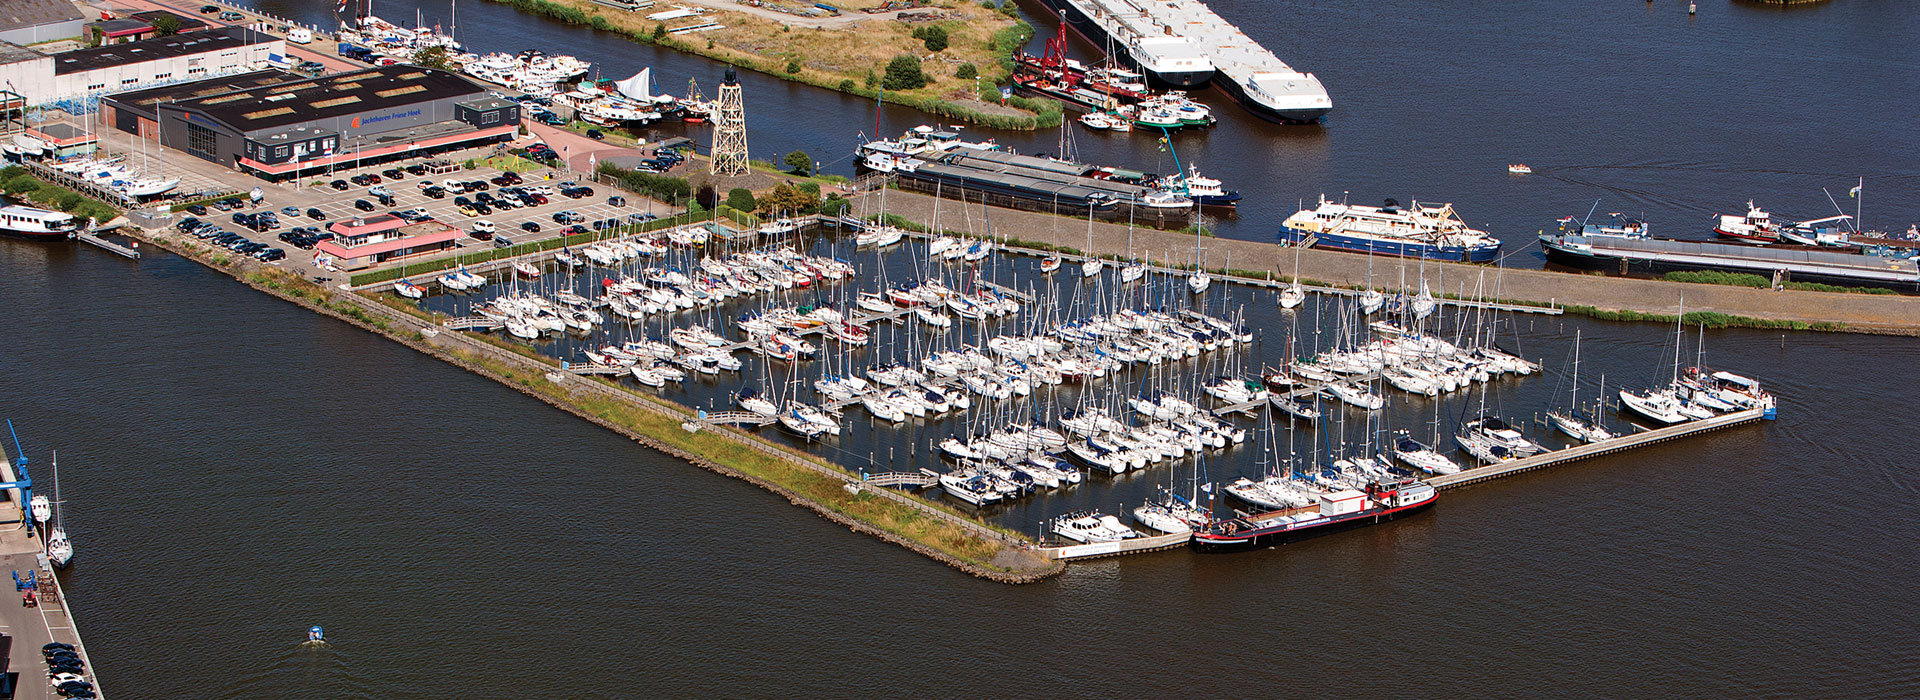 Jachthaven Friese Hoek